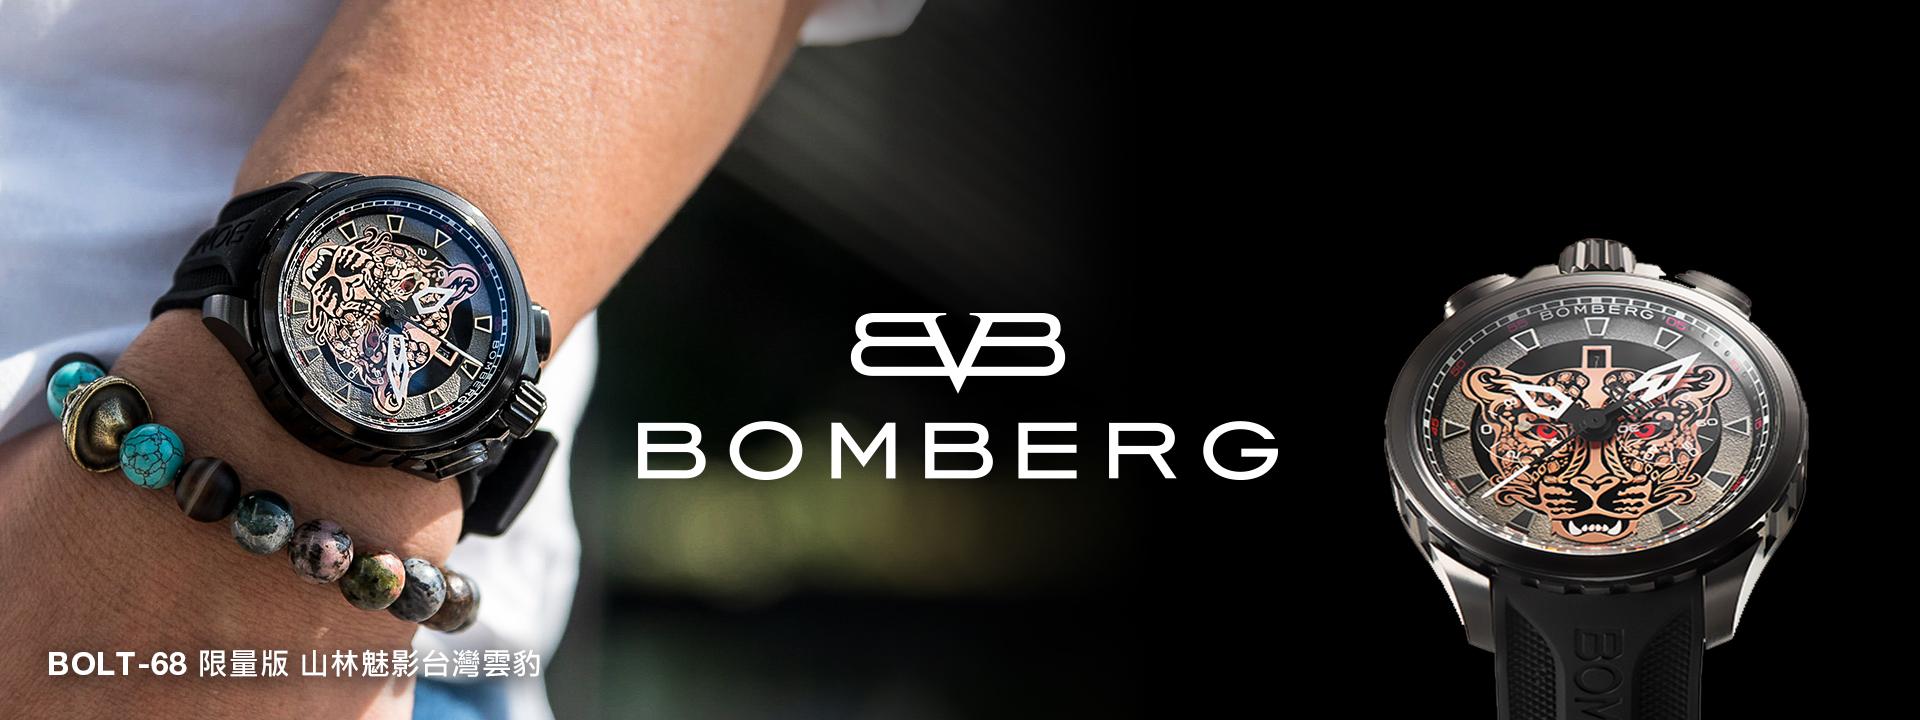 BOMBERG ,bolt-68,懷錶,ultra gears,雲豹